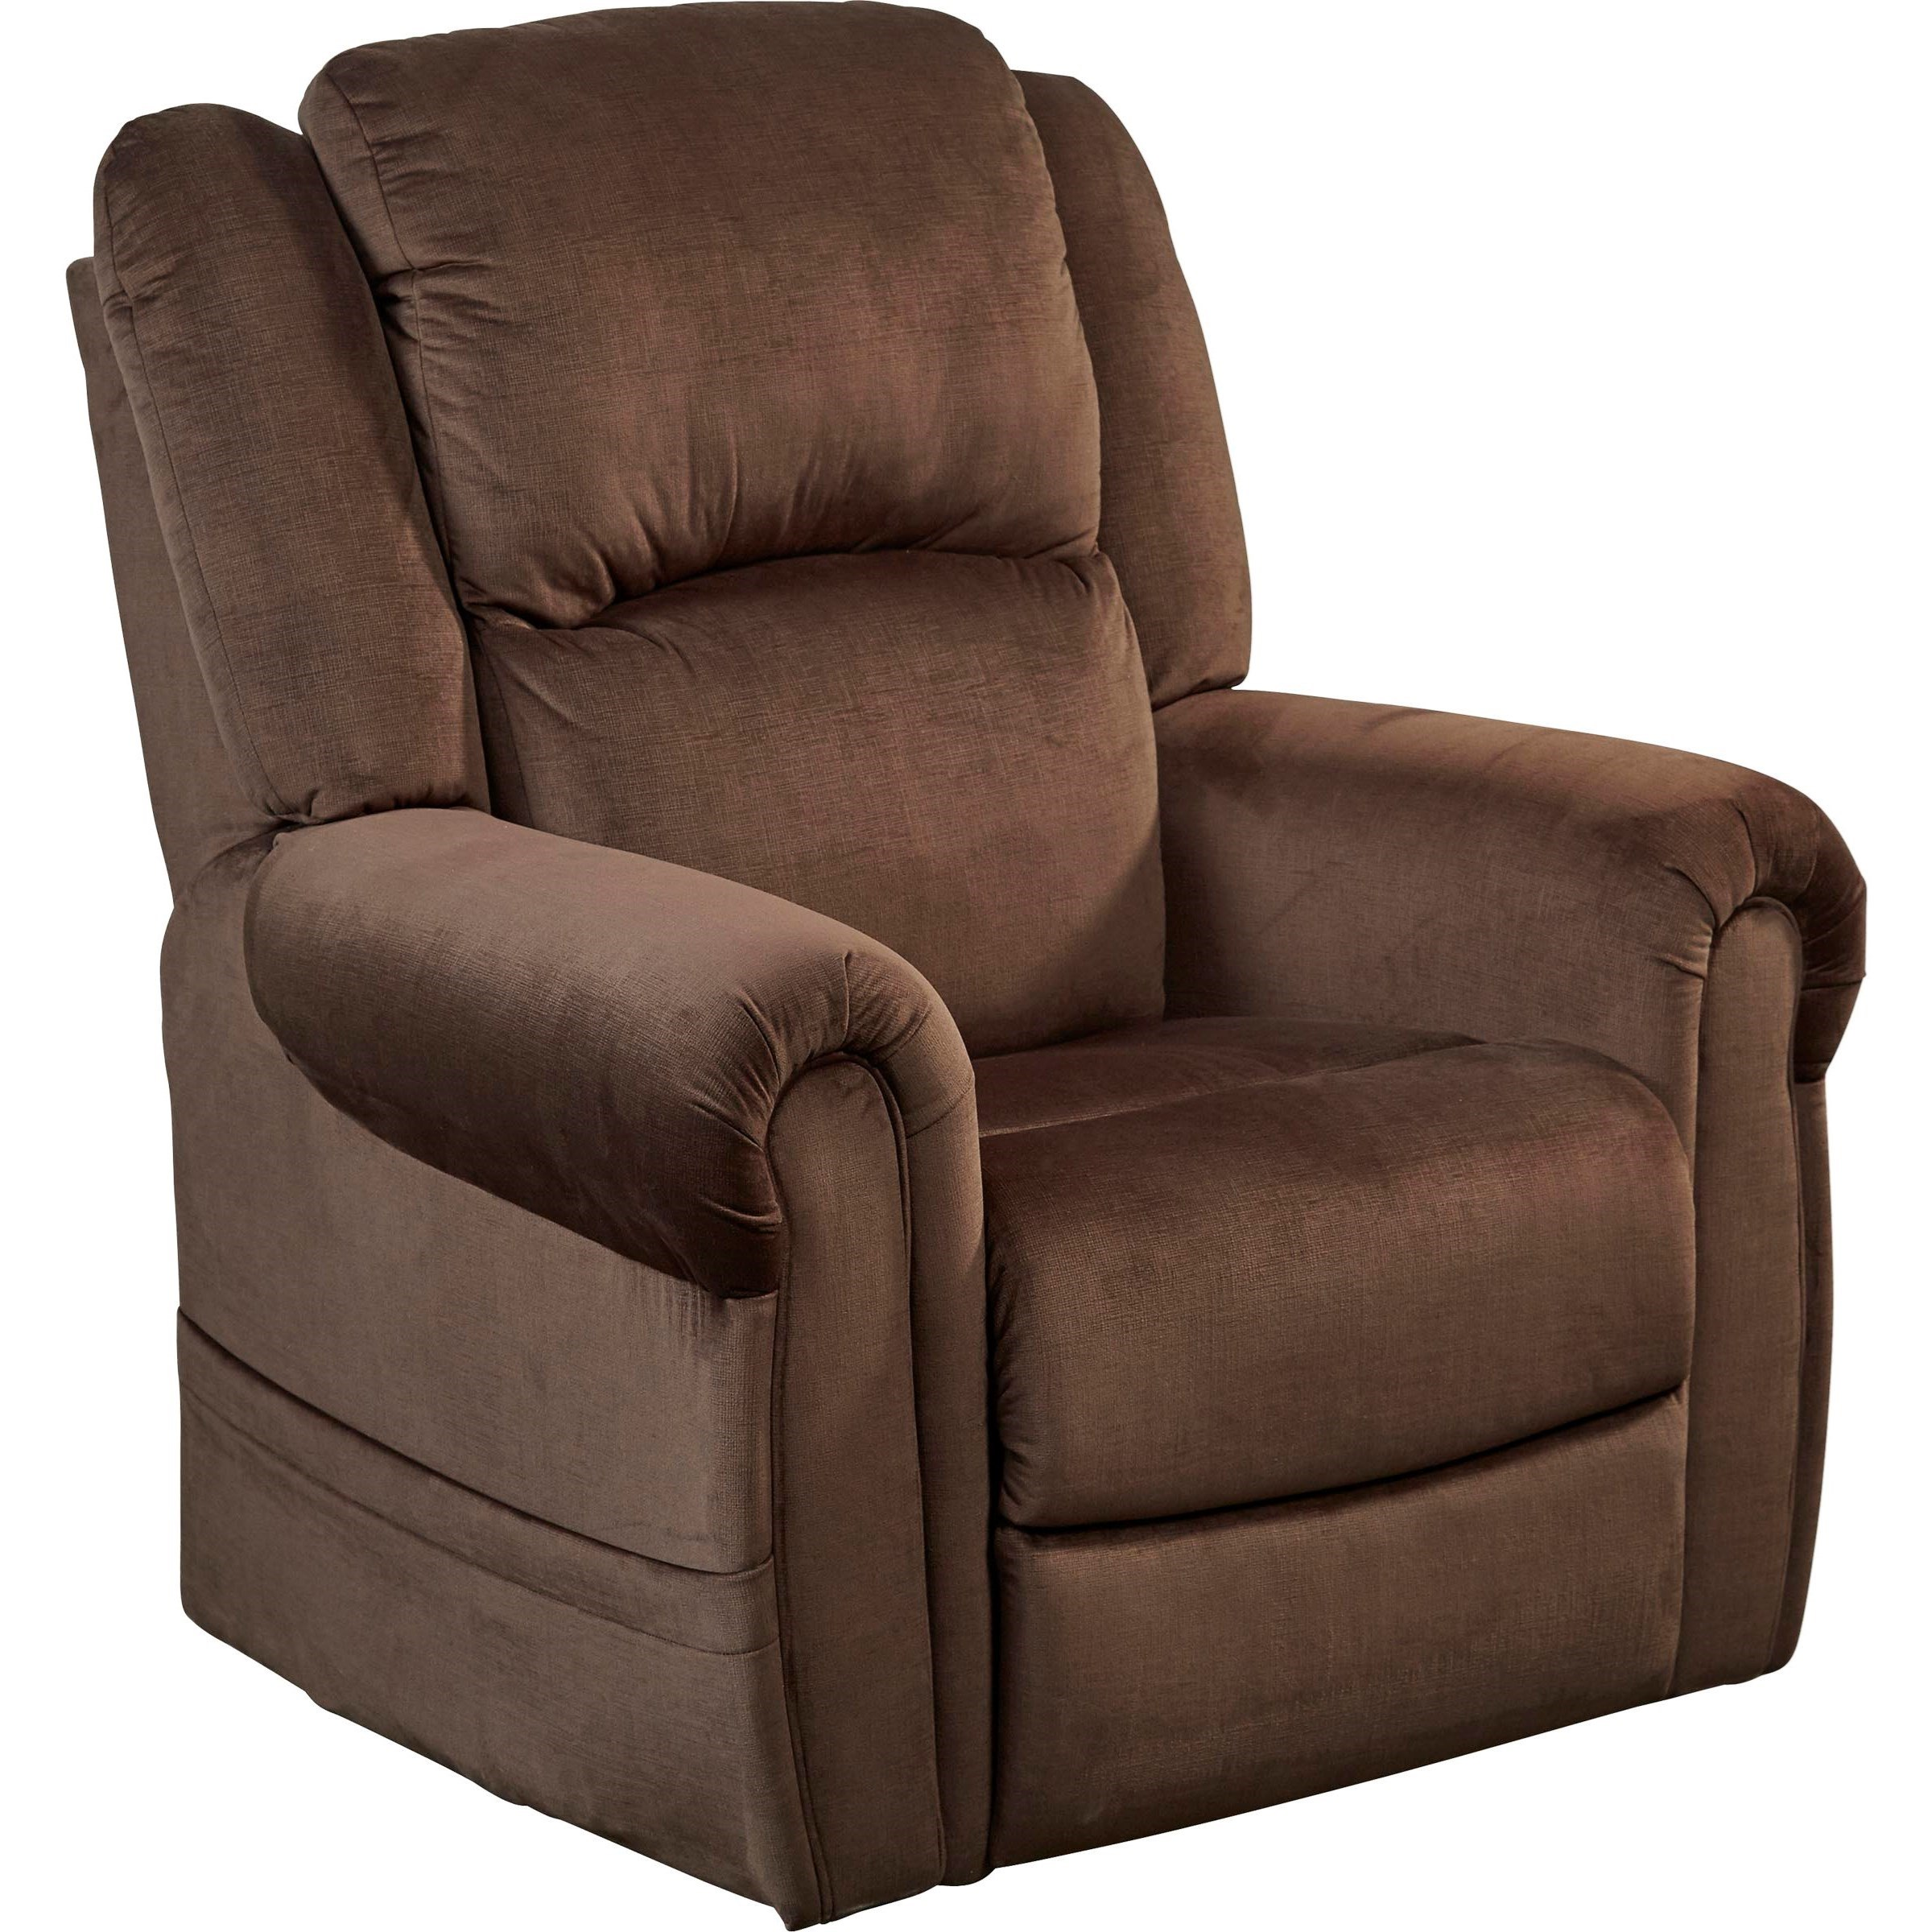 power recliner chair parts chicco portable high reviews catnapper lift manual amazon com